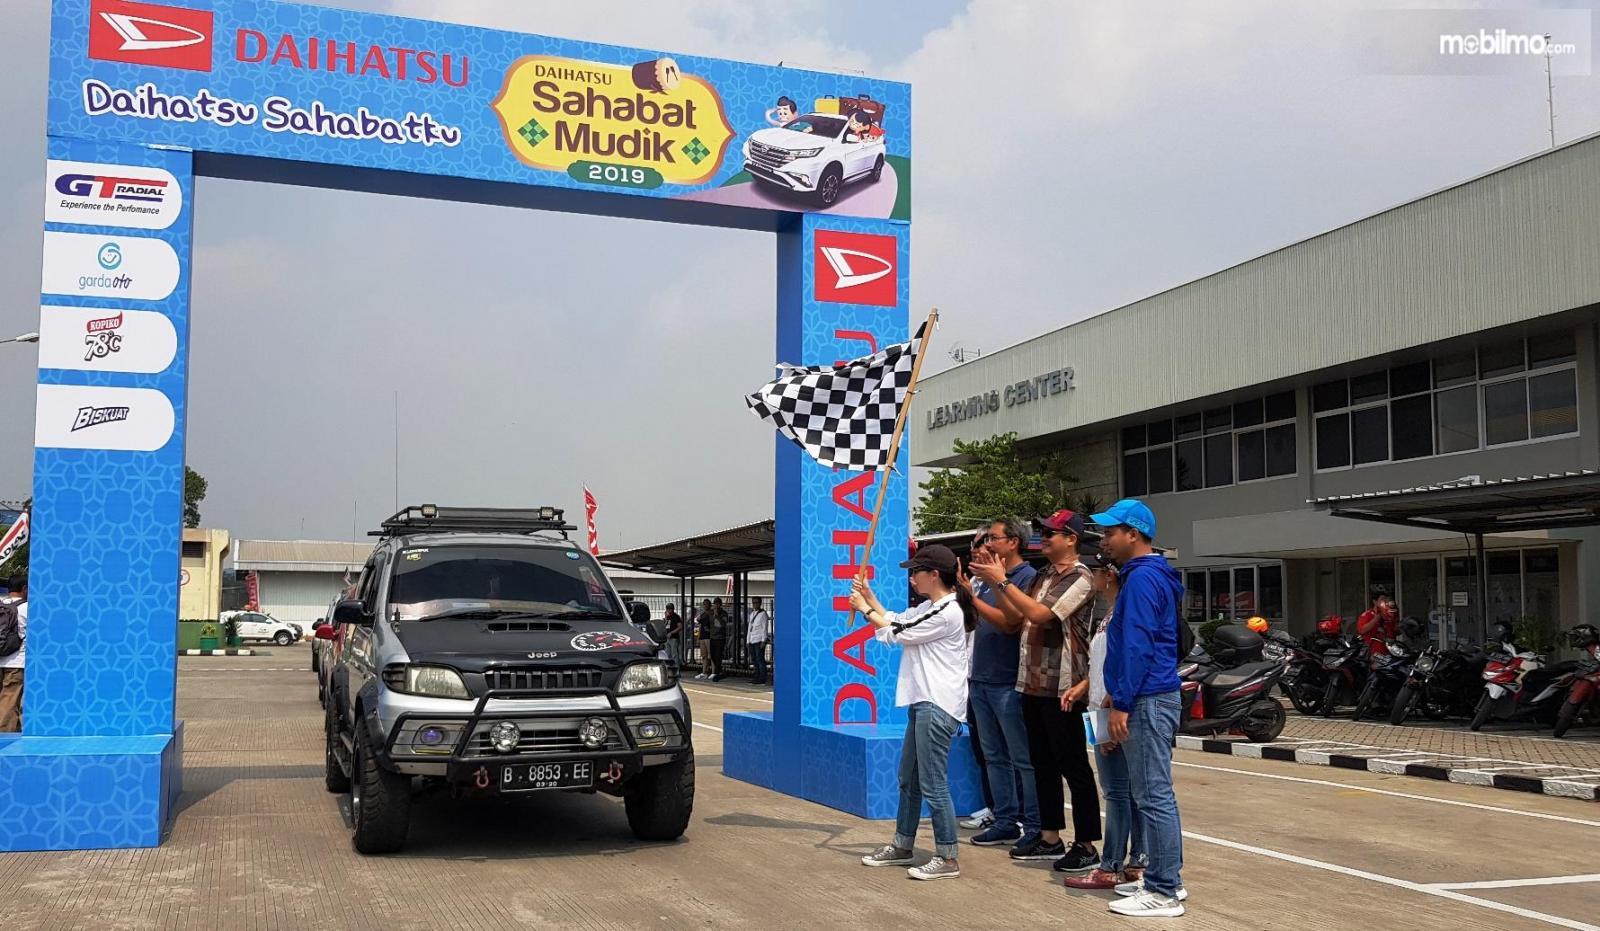 Tampak Daihatsu Sahabat Mudik 2019